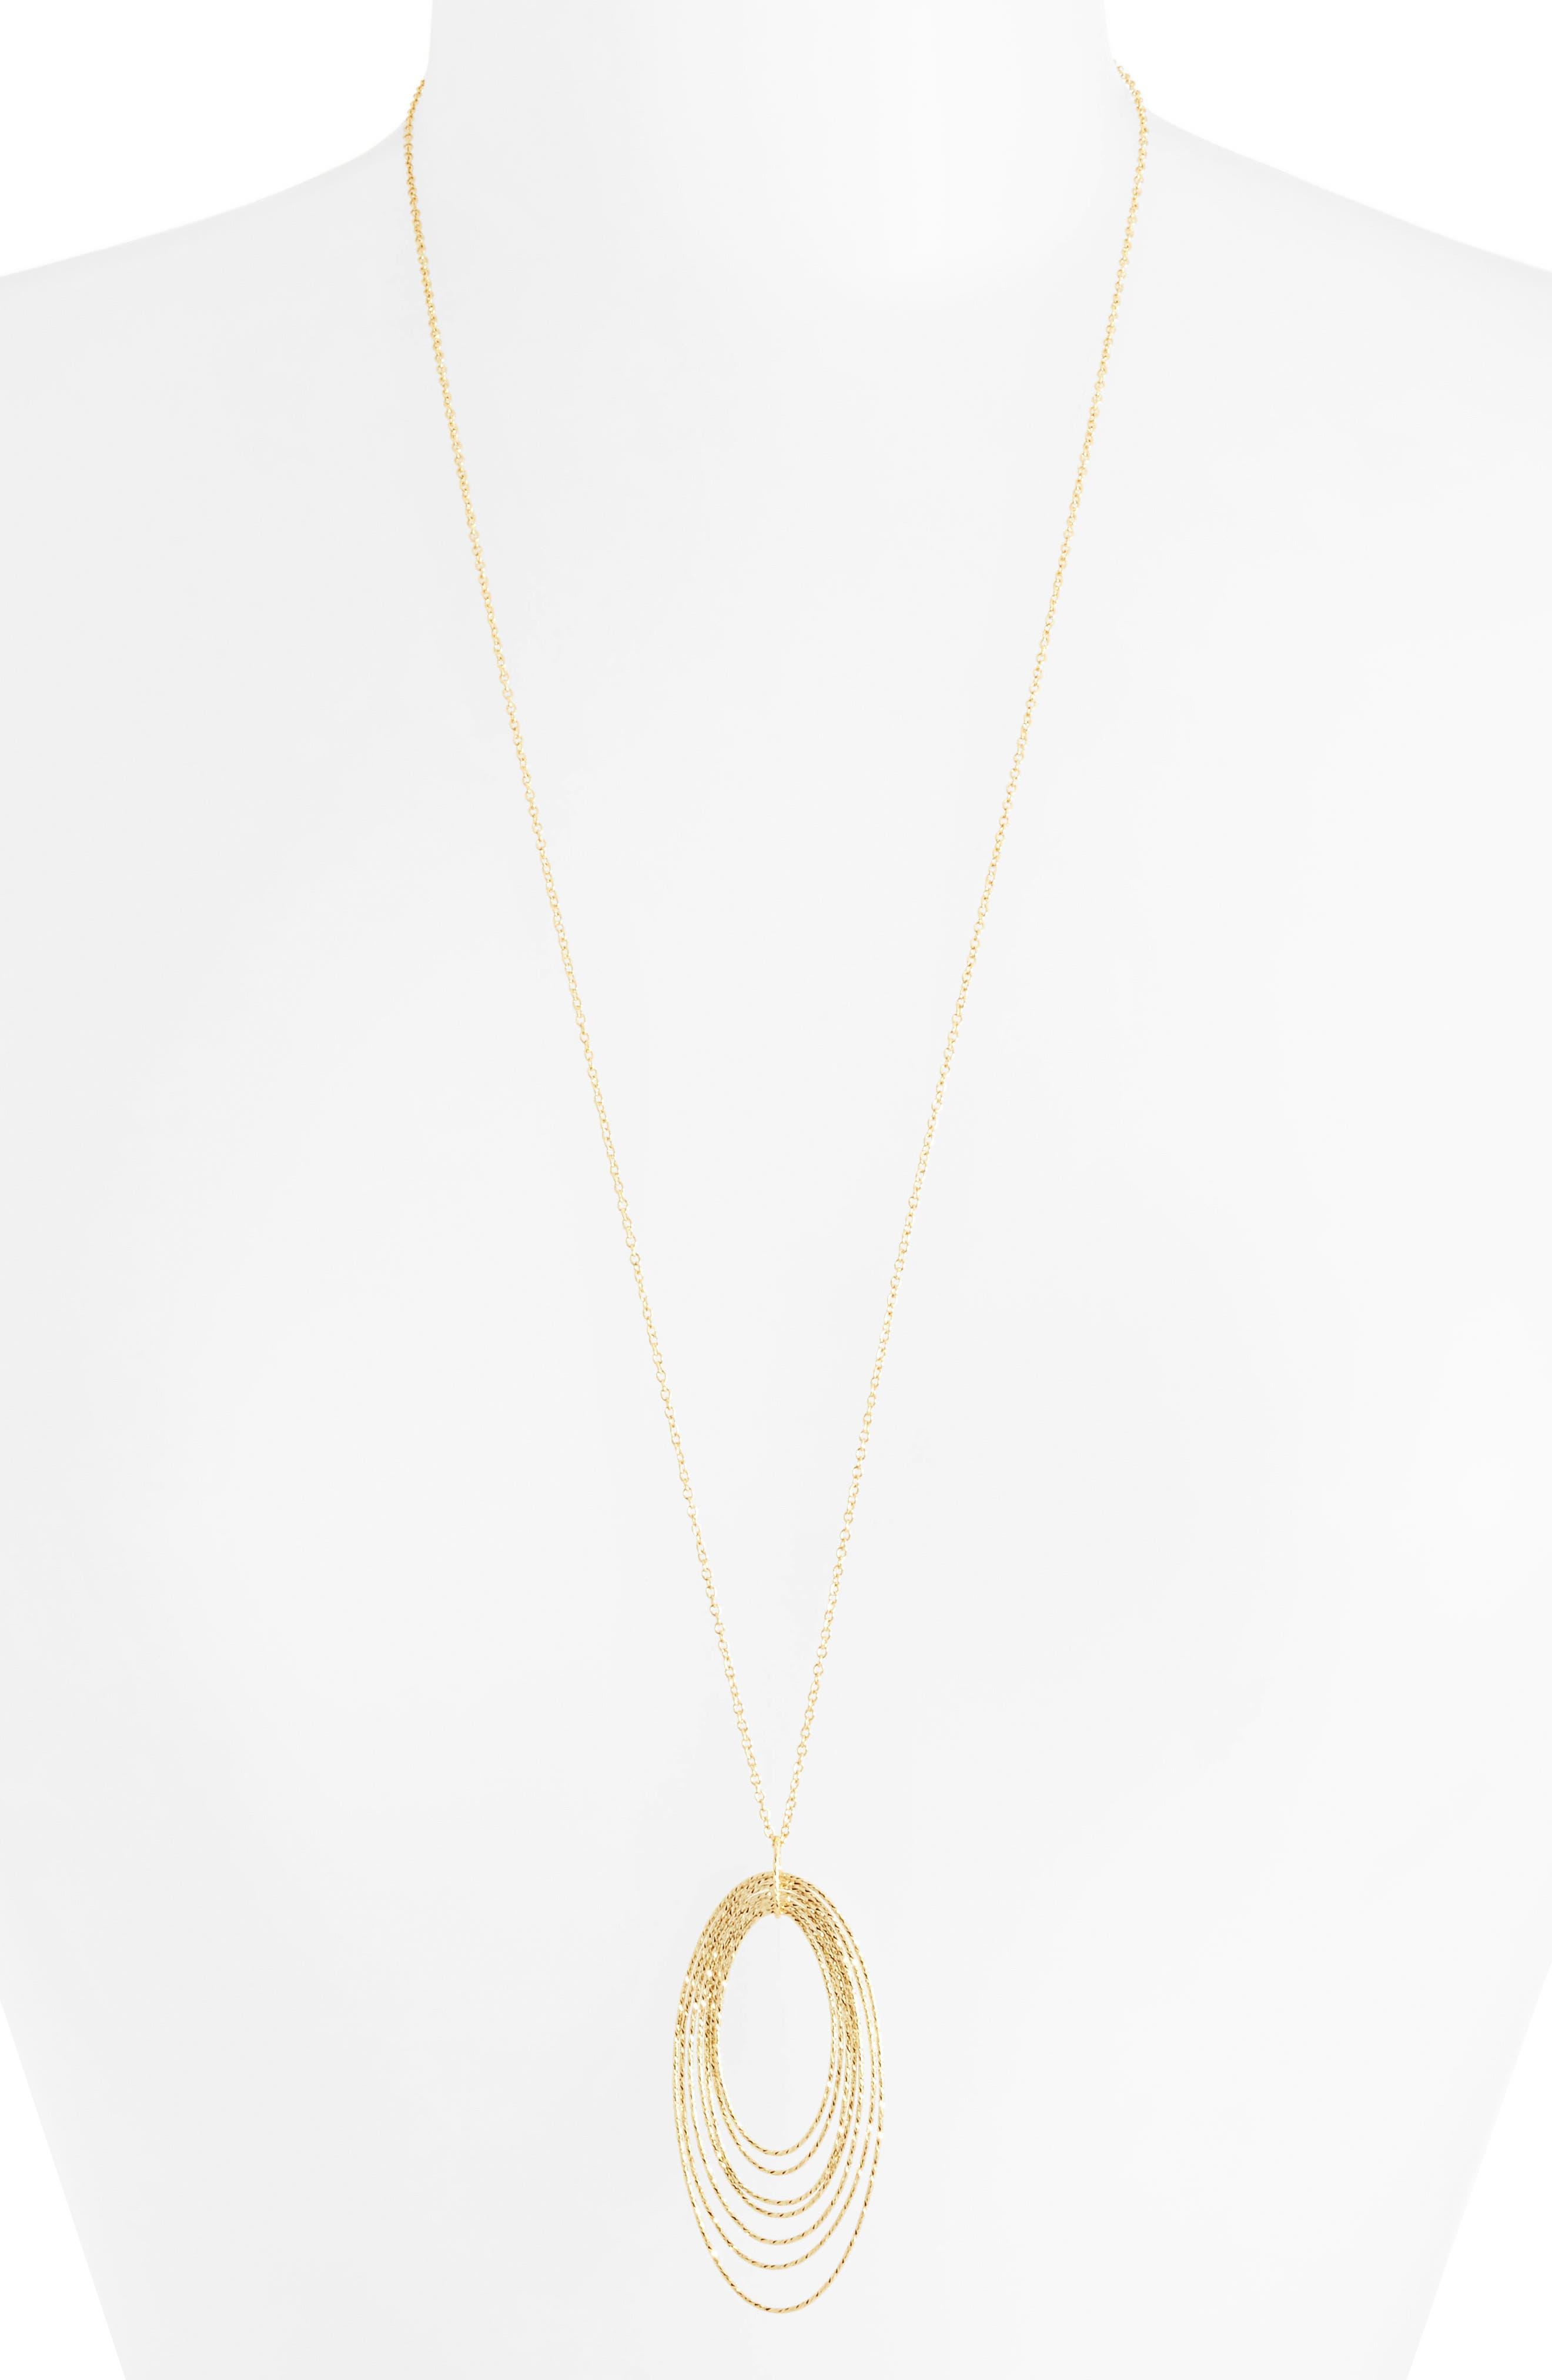 GORJANA Presely Long Adjustable Pendant Necklace, Main, color, GOLD